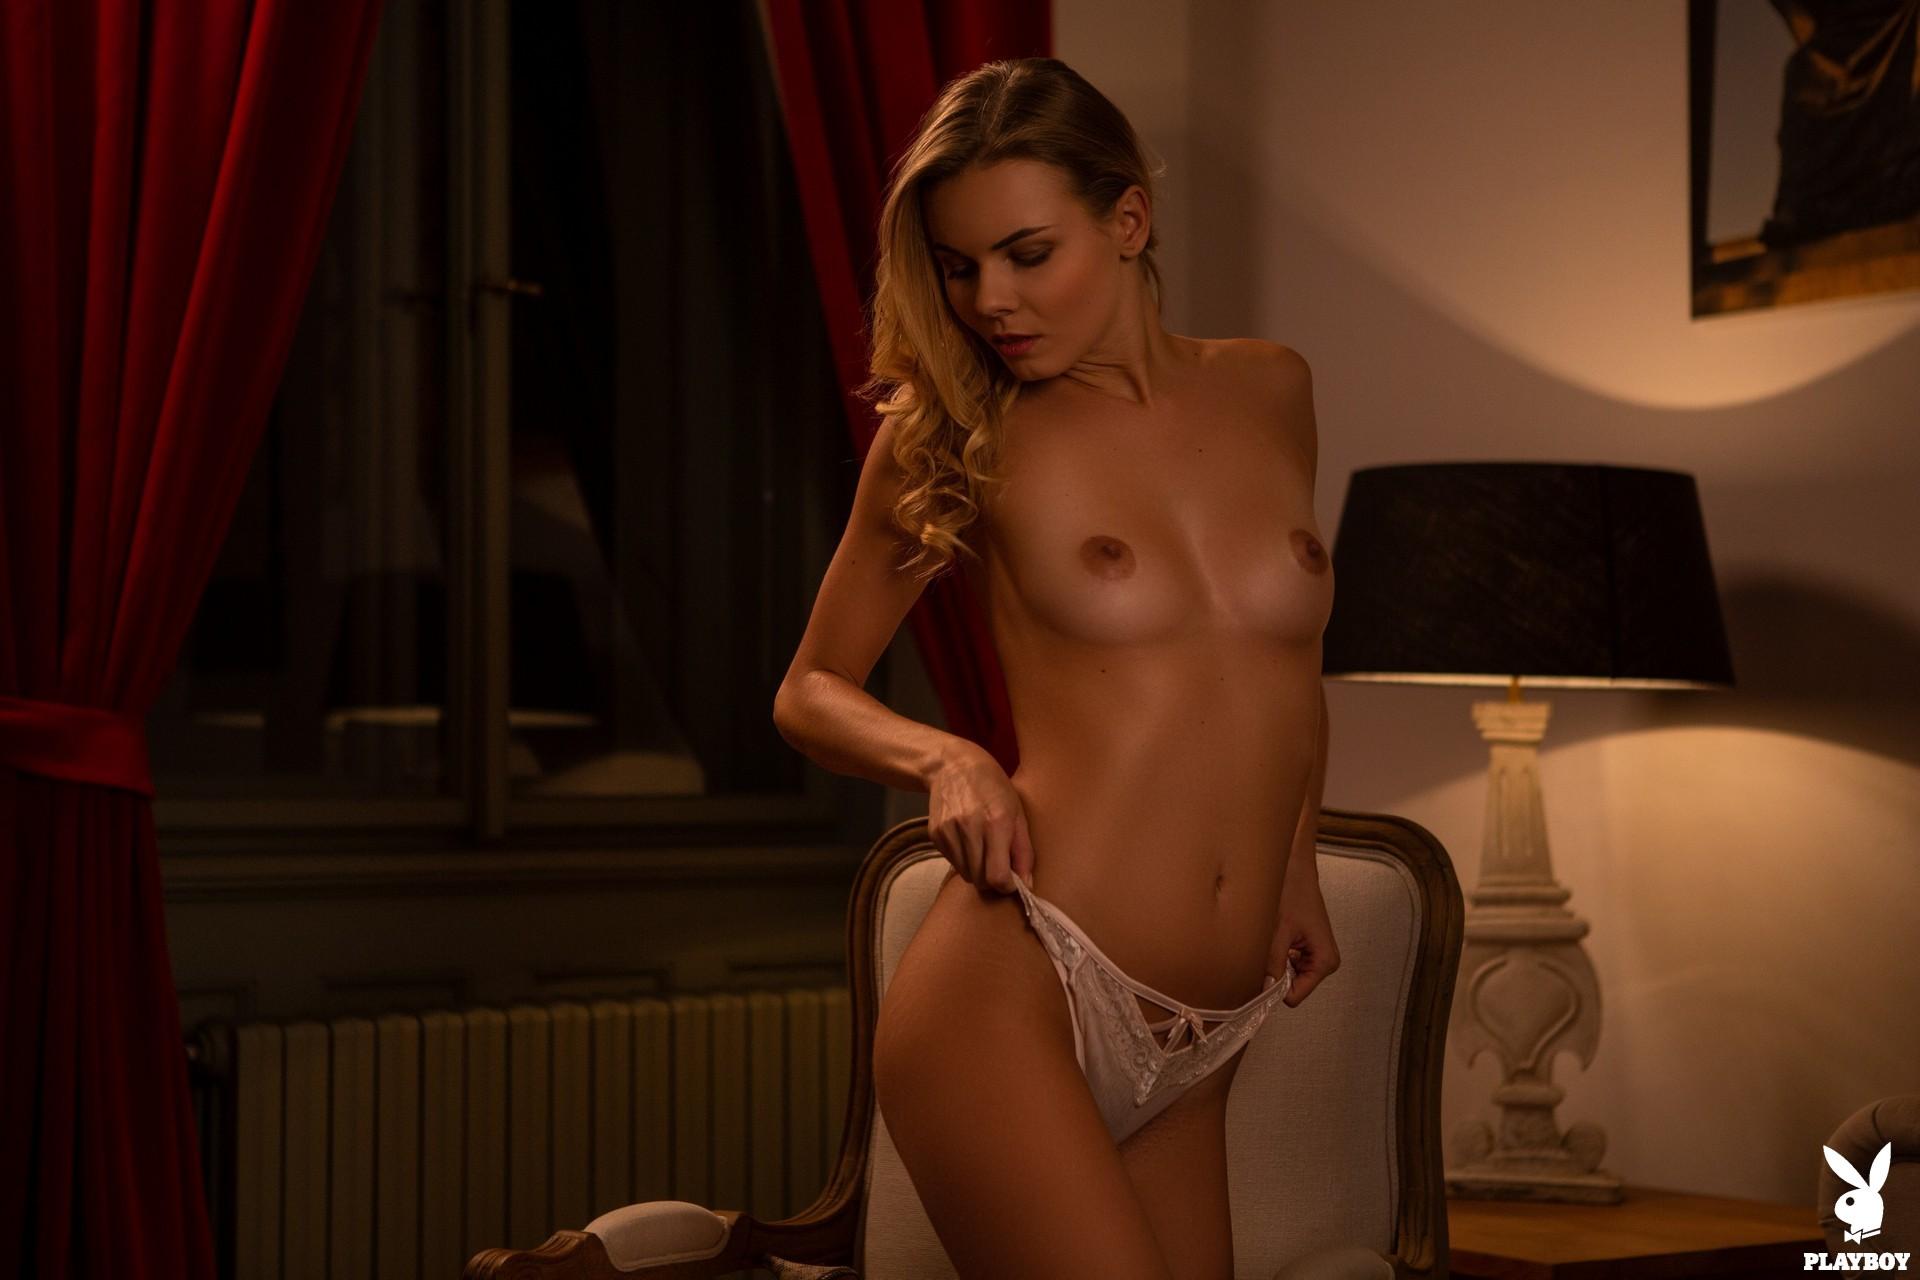 Kate Jones in Exquisite Allure - Playboy Plus 32